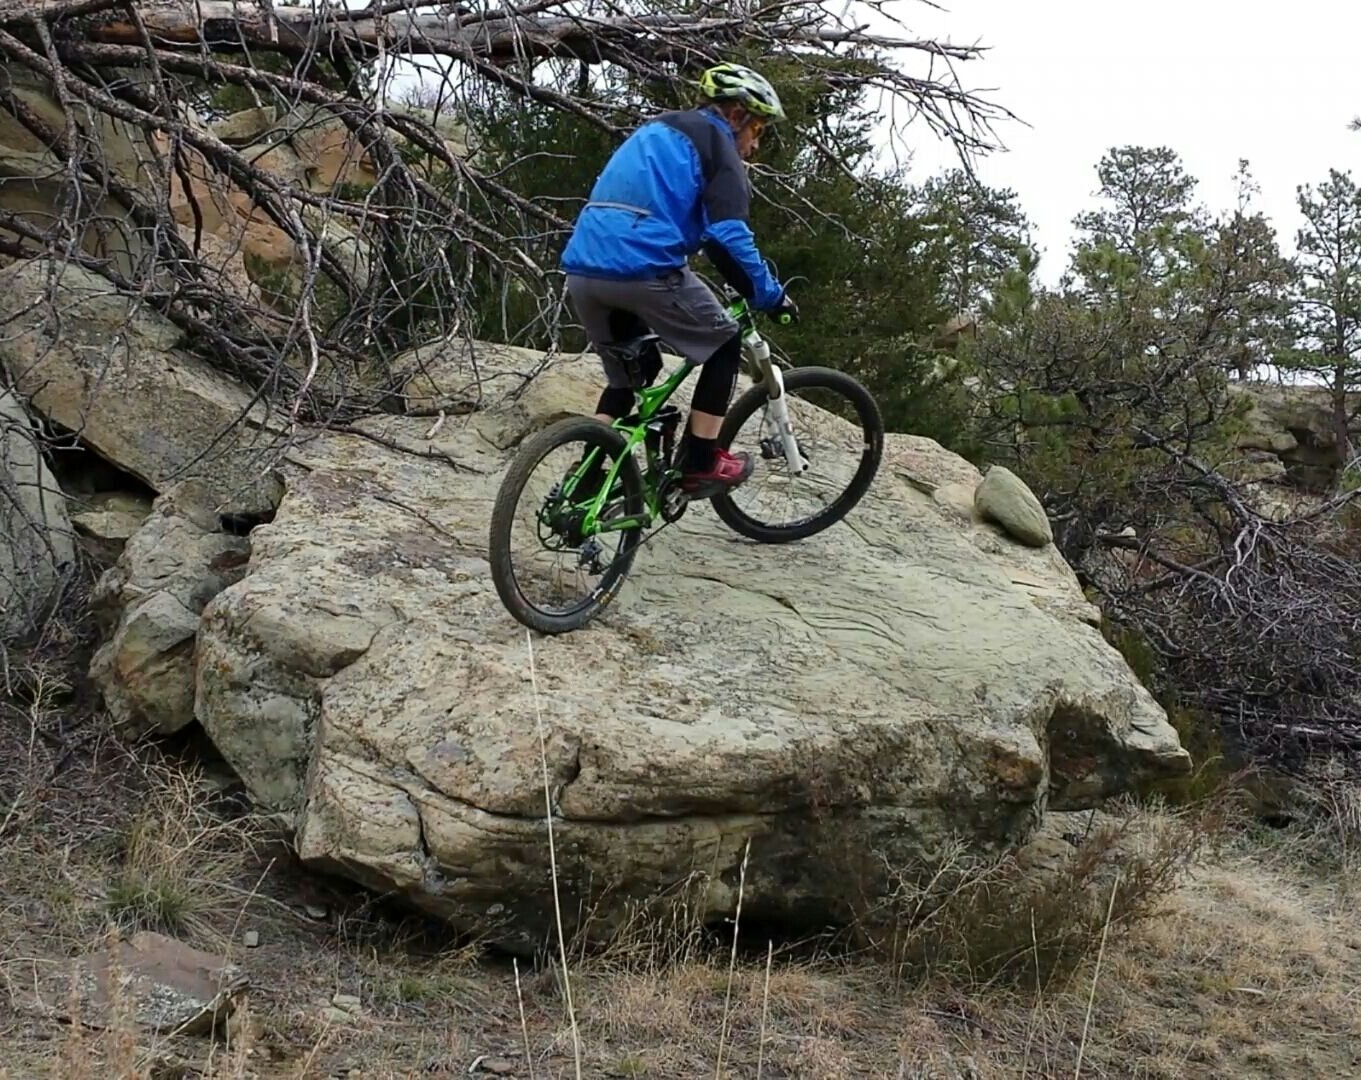 Rock ride - Jase - Mountain Biking Pictures - Vital MTB